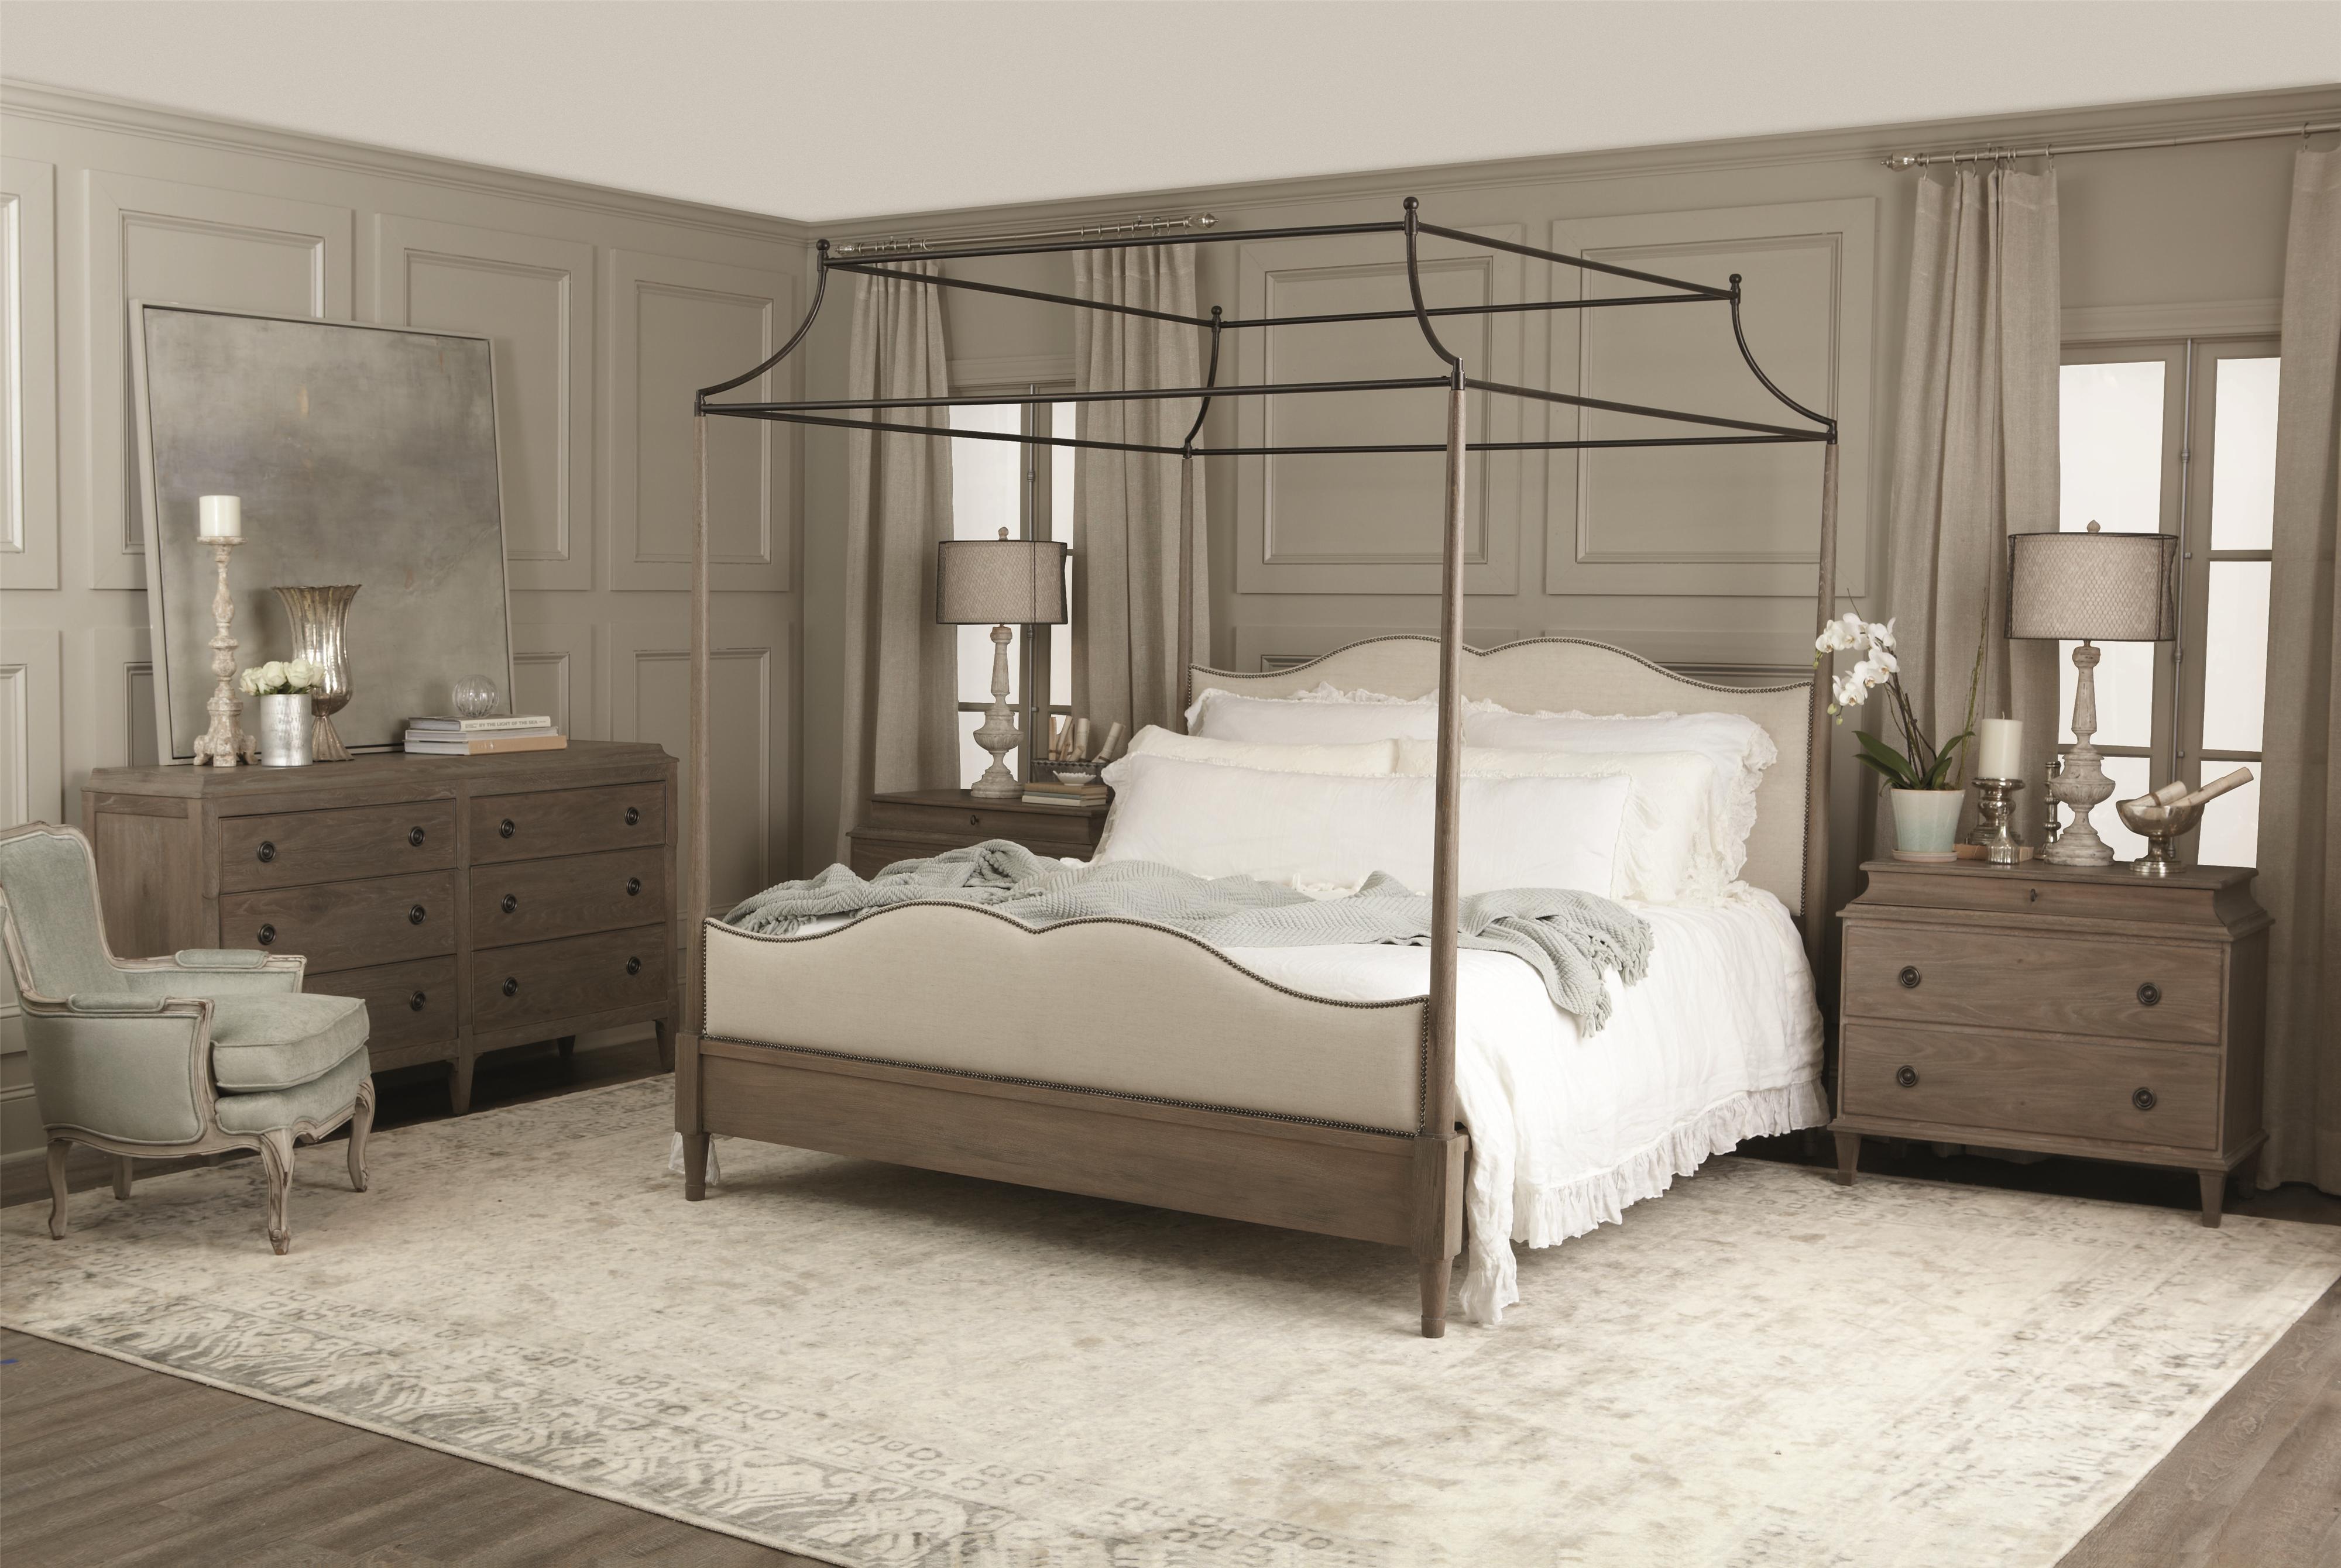 Auberge King Bedroom Group 4 at Williams & Kay